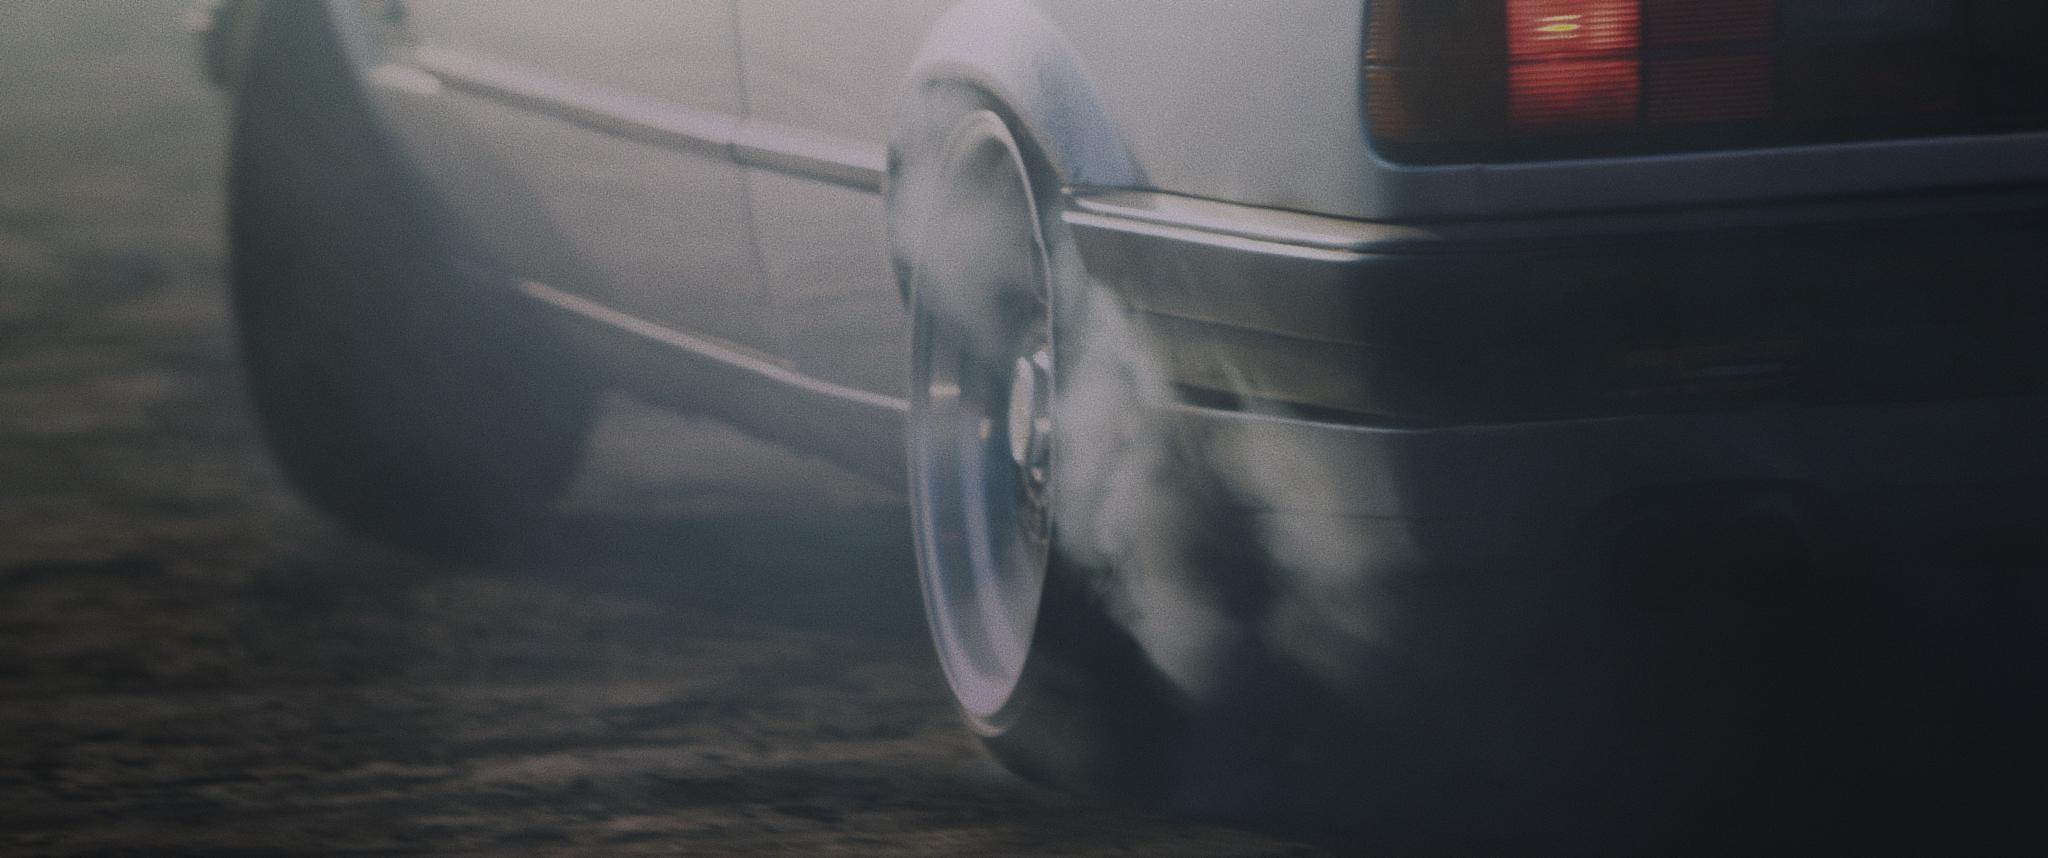 Gasoline_FINAL_1.38.1.jpg